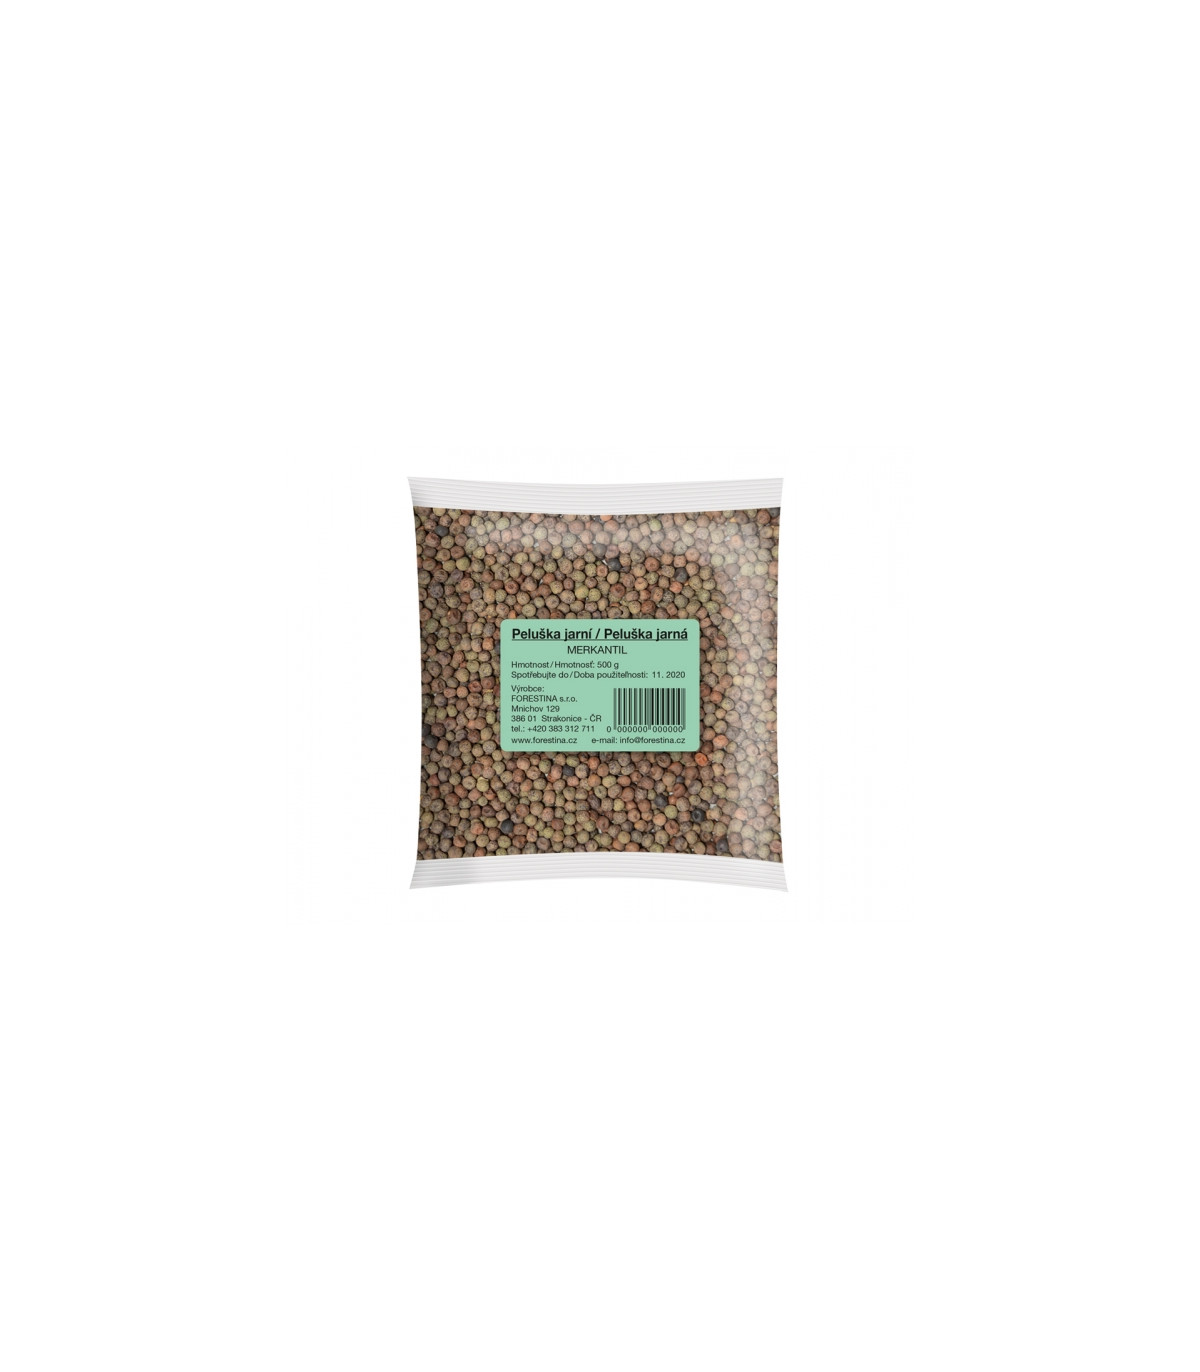 Peluška jarná - Forestina - 500 g